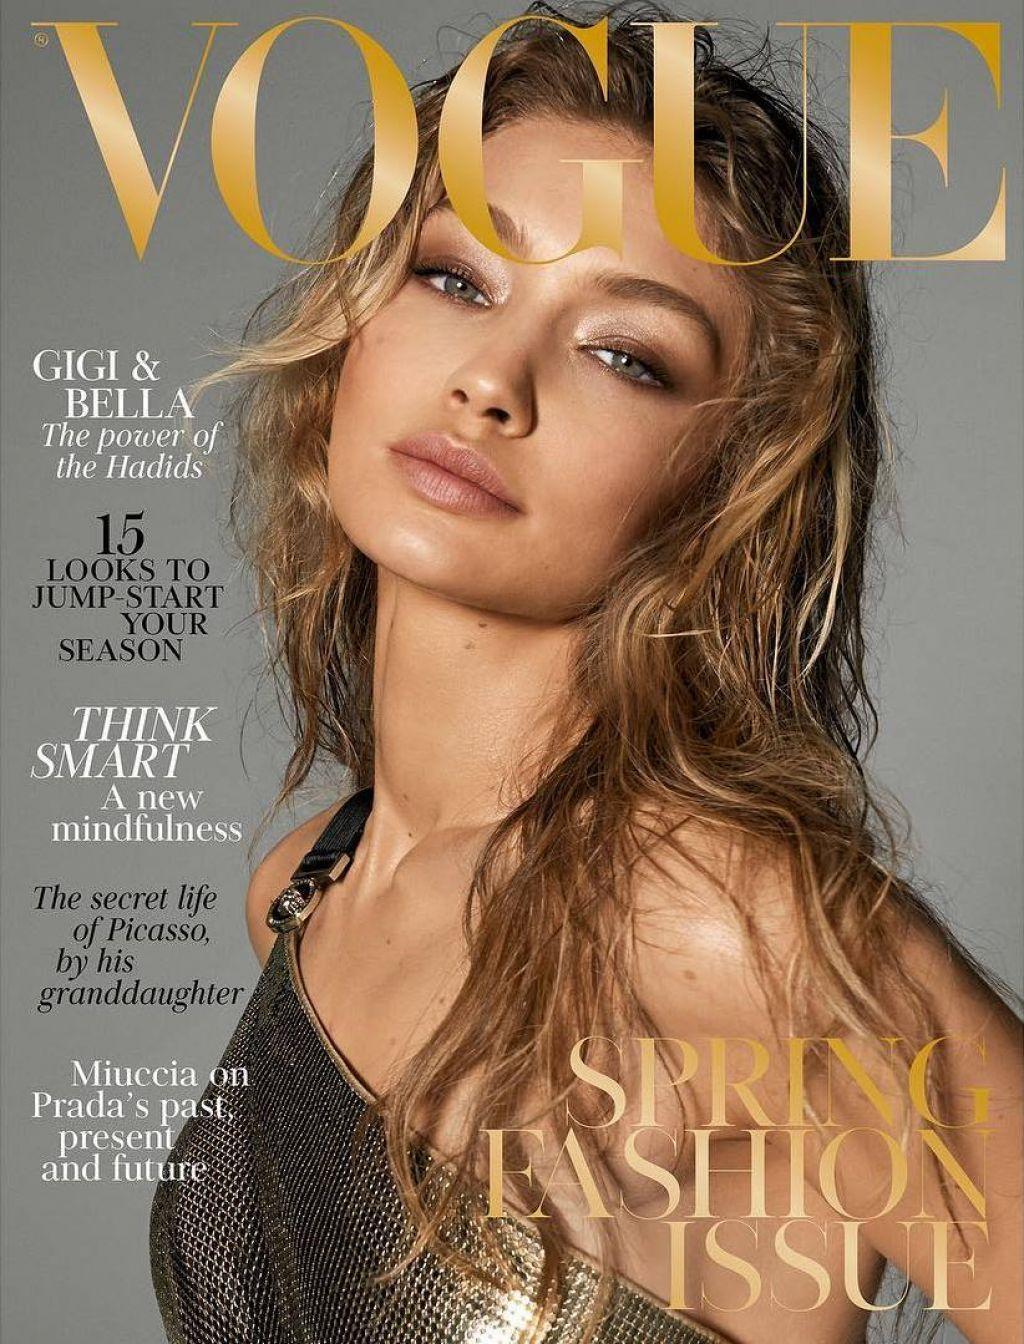 Gigi Hadid Vogue Covers